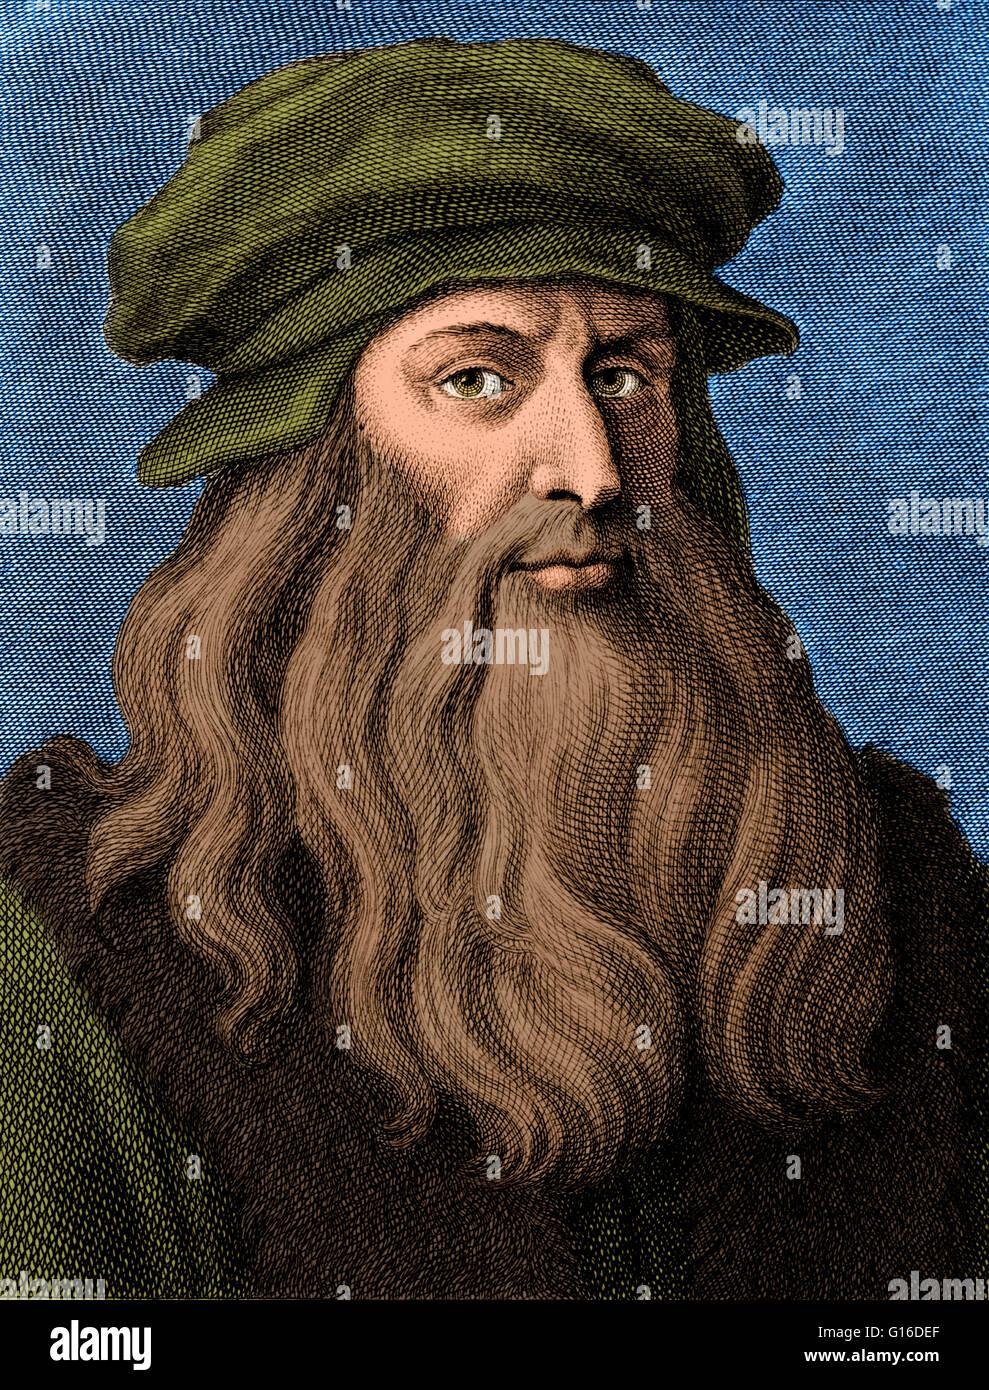 leonardo di ser piero da vinci Leonardo di ser piero da vinci, leonardo: descrizione: pittore, ingegnere, astronomo, filosofo,  pagine nella categoria leonardo da vinci.